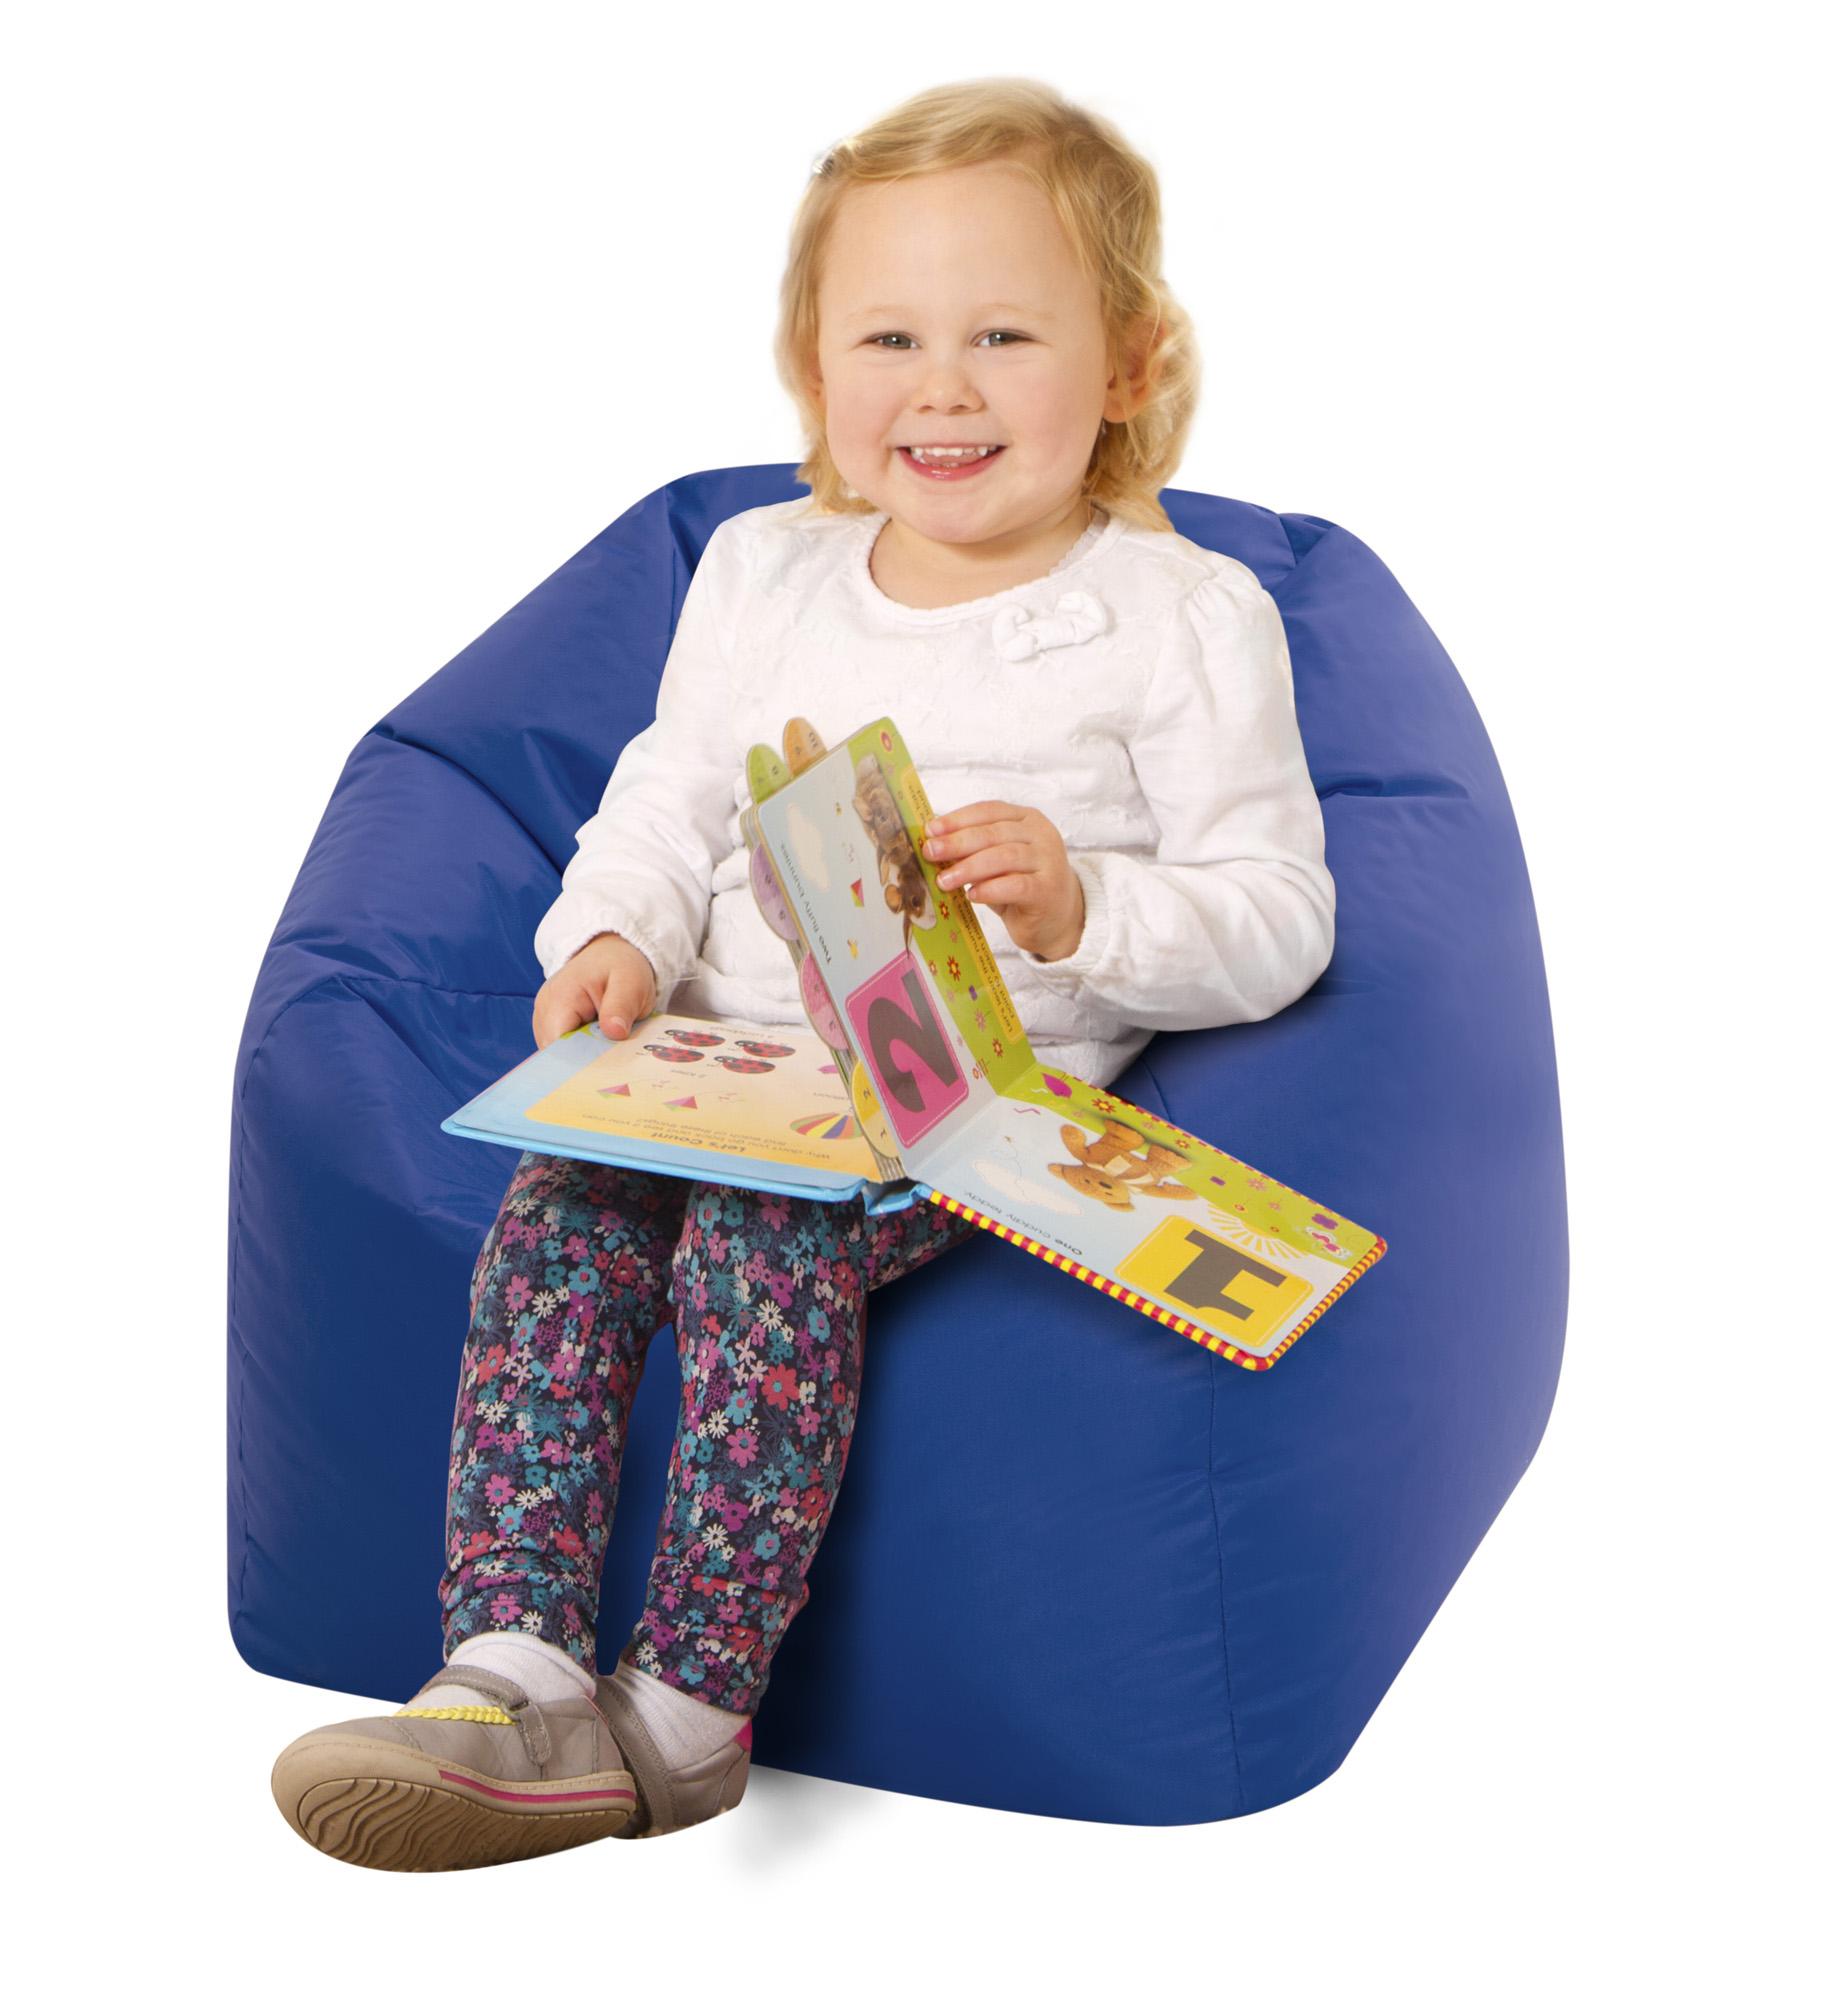 Eden-New-Nursery-Beanbag-blue-300dpi-1